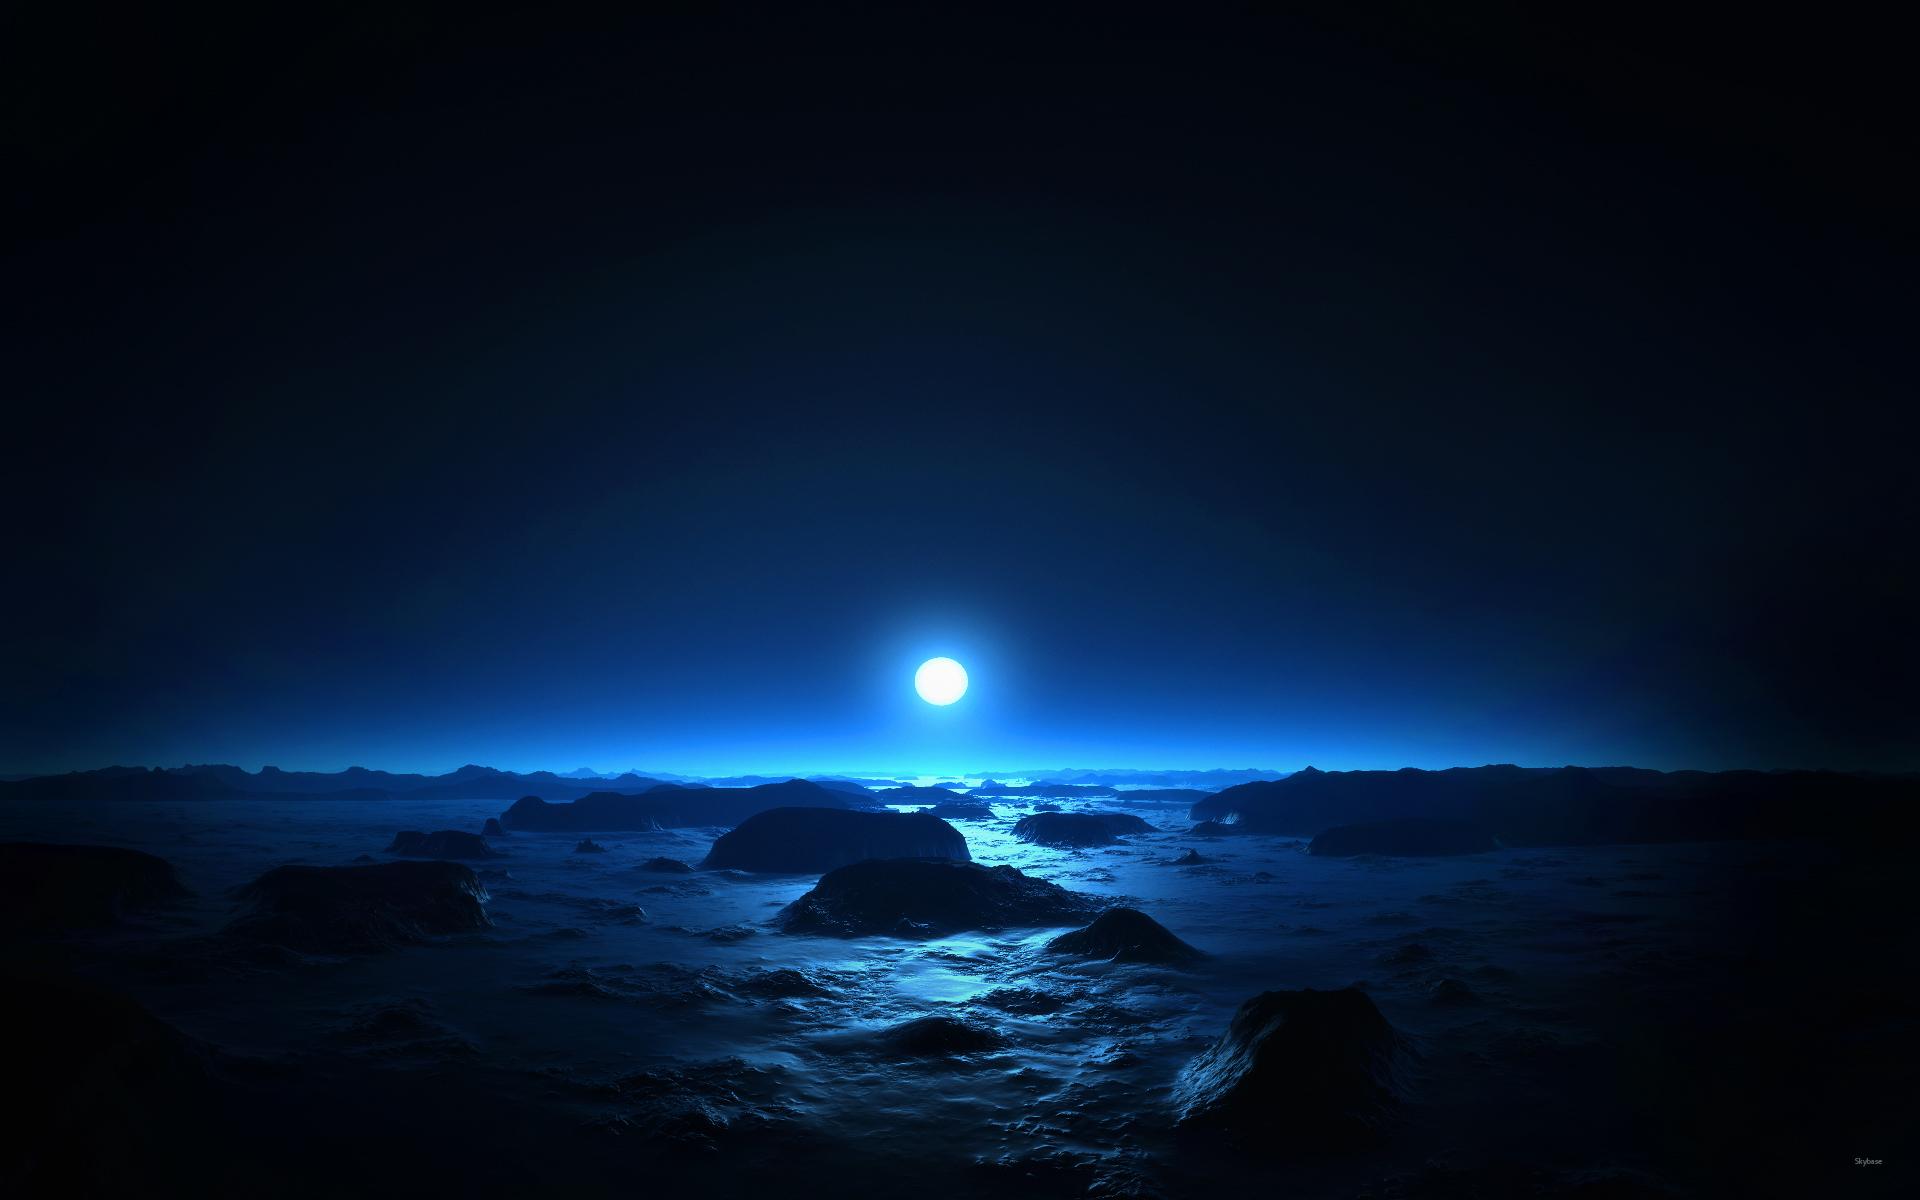 Sea Moon at Mid Night Wallpapers HD Wallpapers 1920x1200